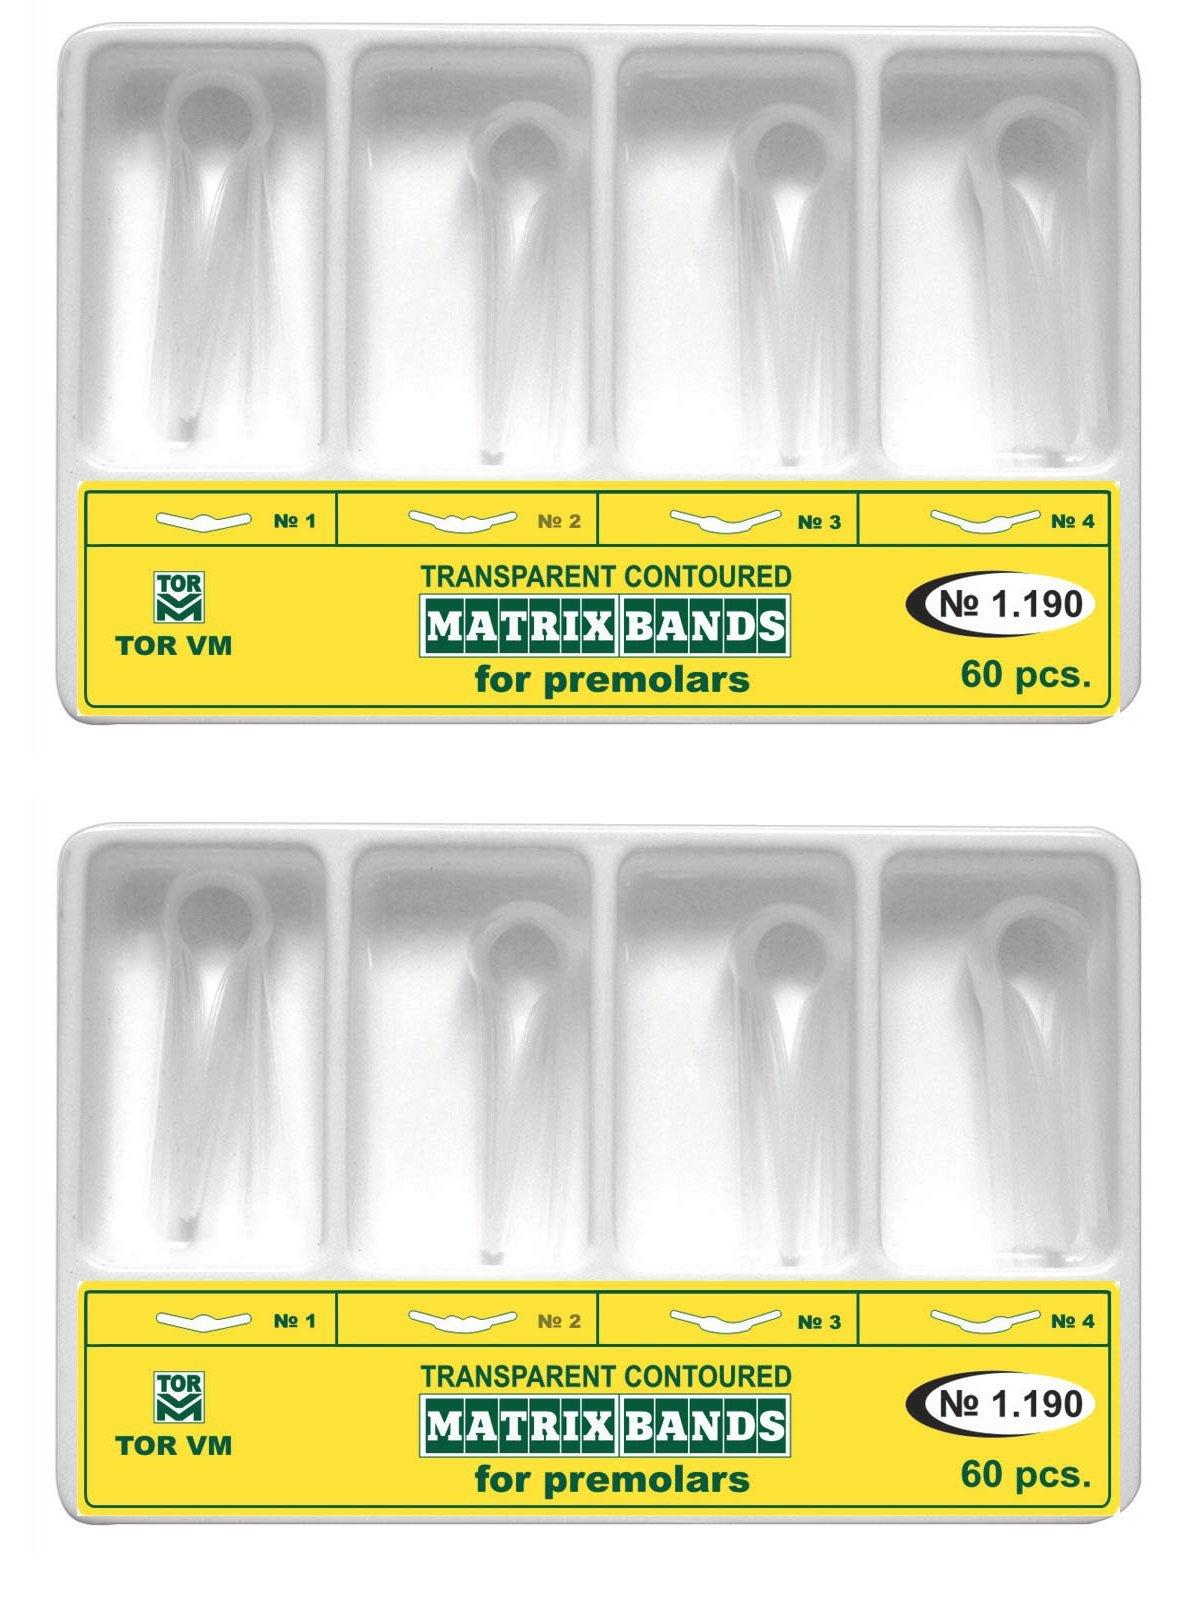 Lot x 2 Dental Kit of Premolar Transparent Contoured Matrix Matrices Bands 60 pcs./pack